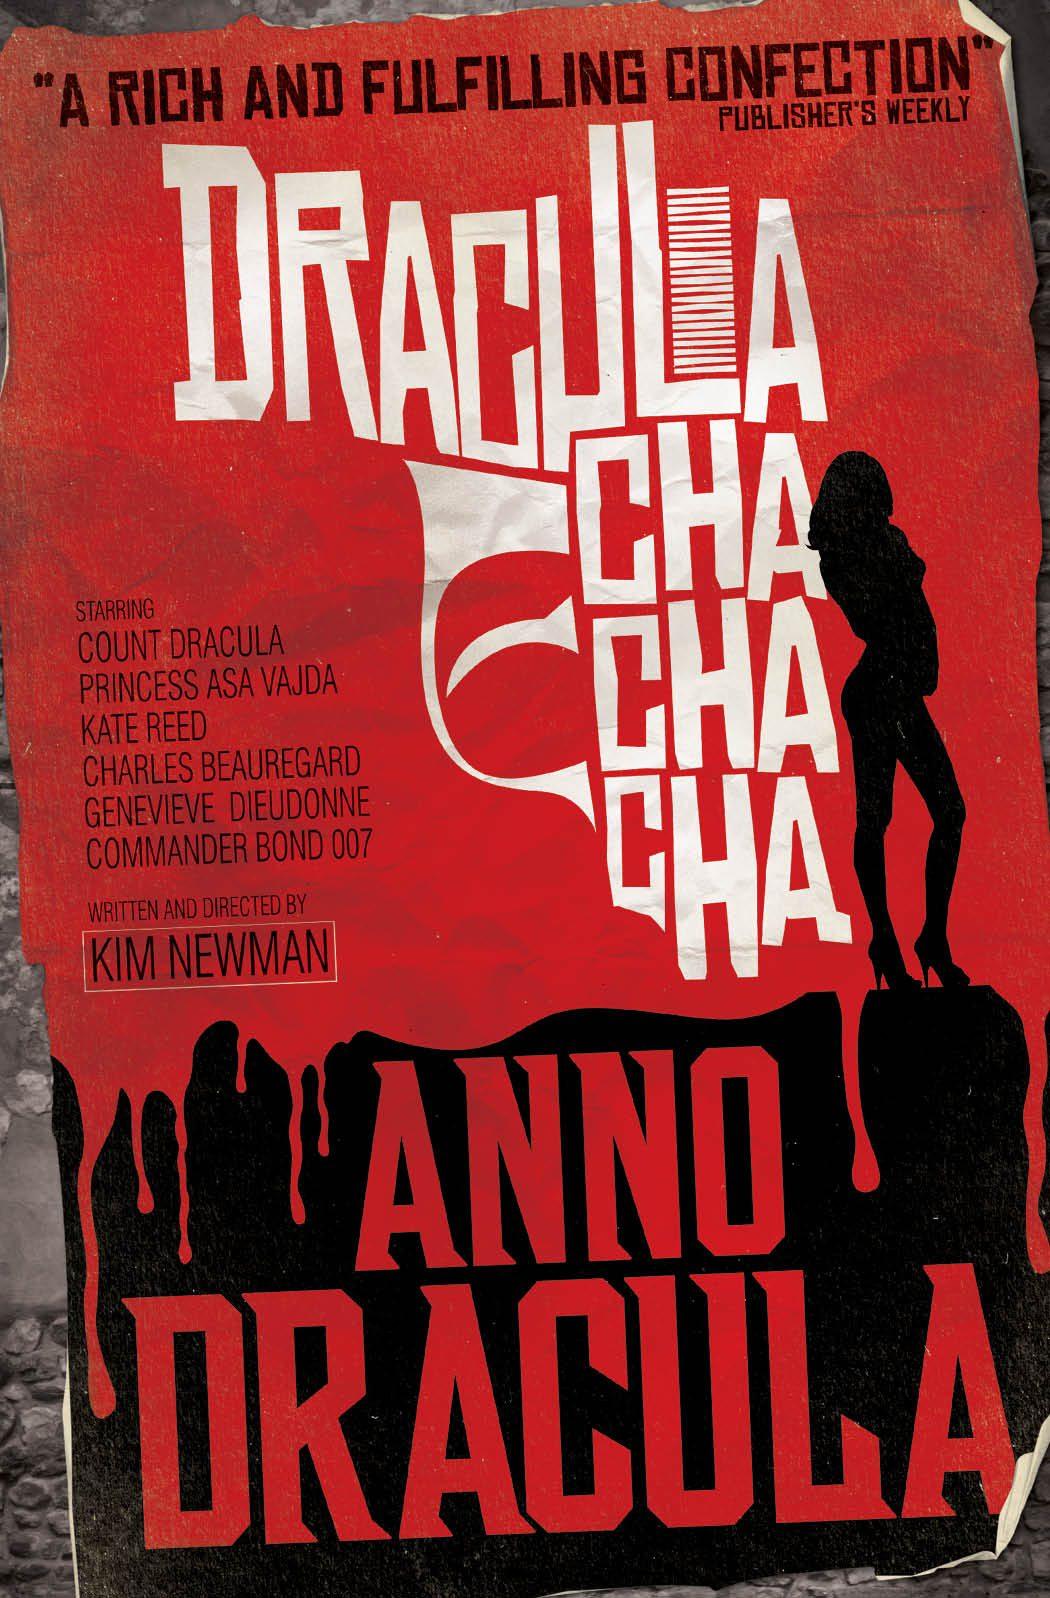 Anno Dracula Cha Cha Cha cover